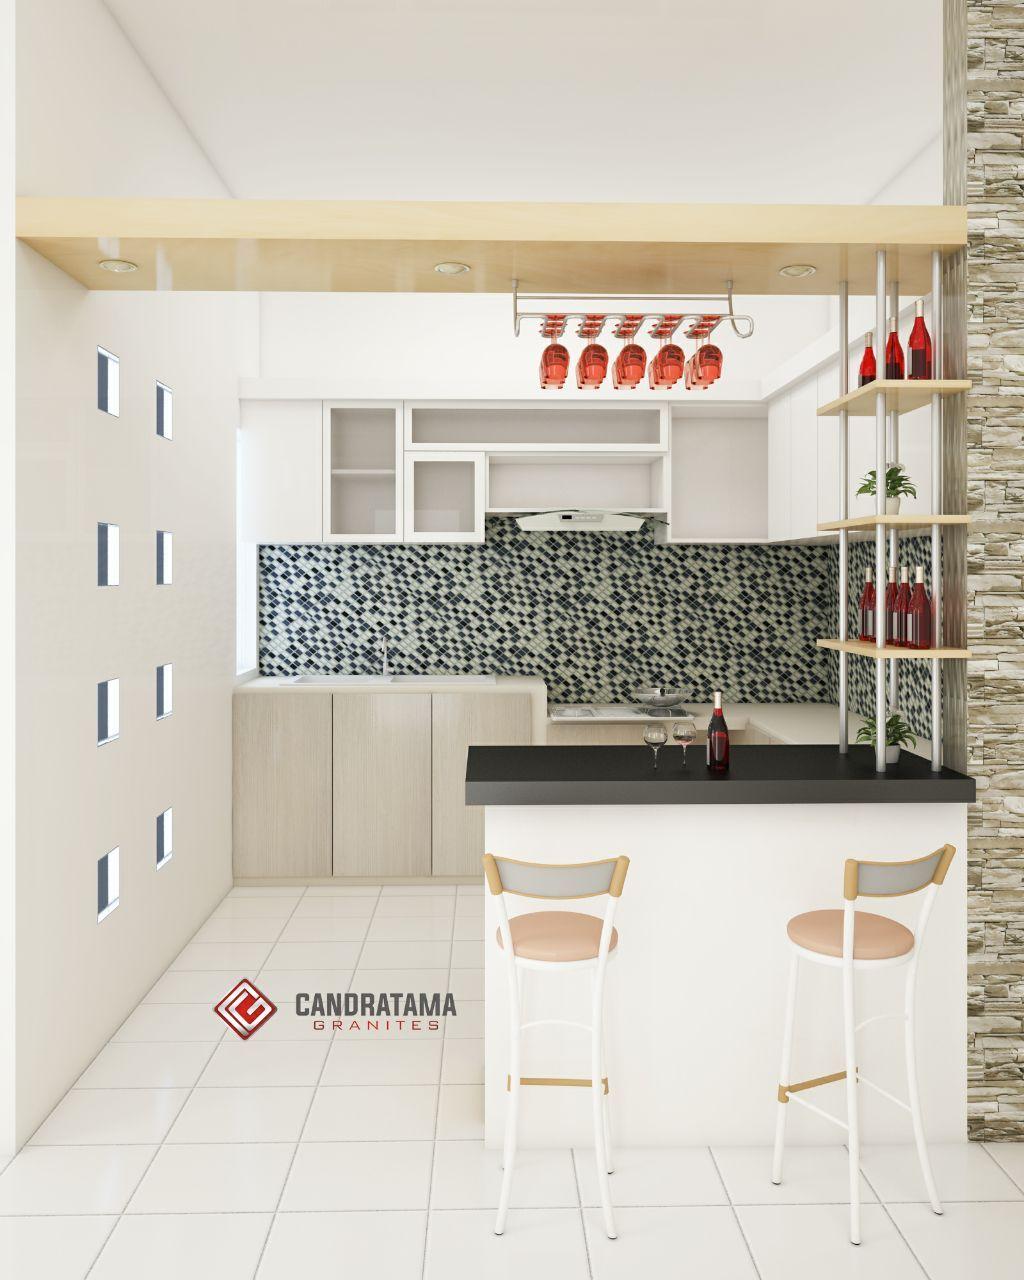 Dapur Mini Bar Rumah Minimalis Dekorasi Rumah Mini bar rumah minimalis